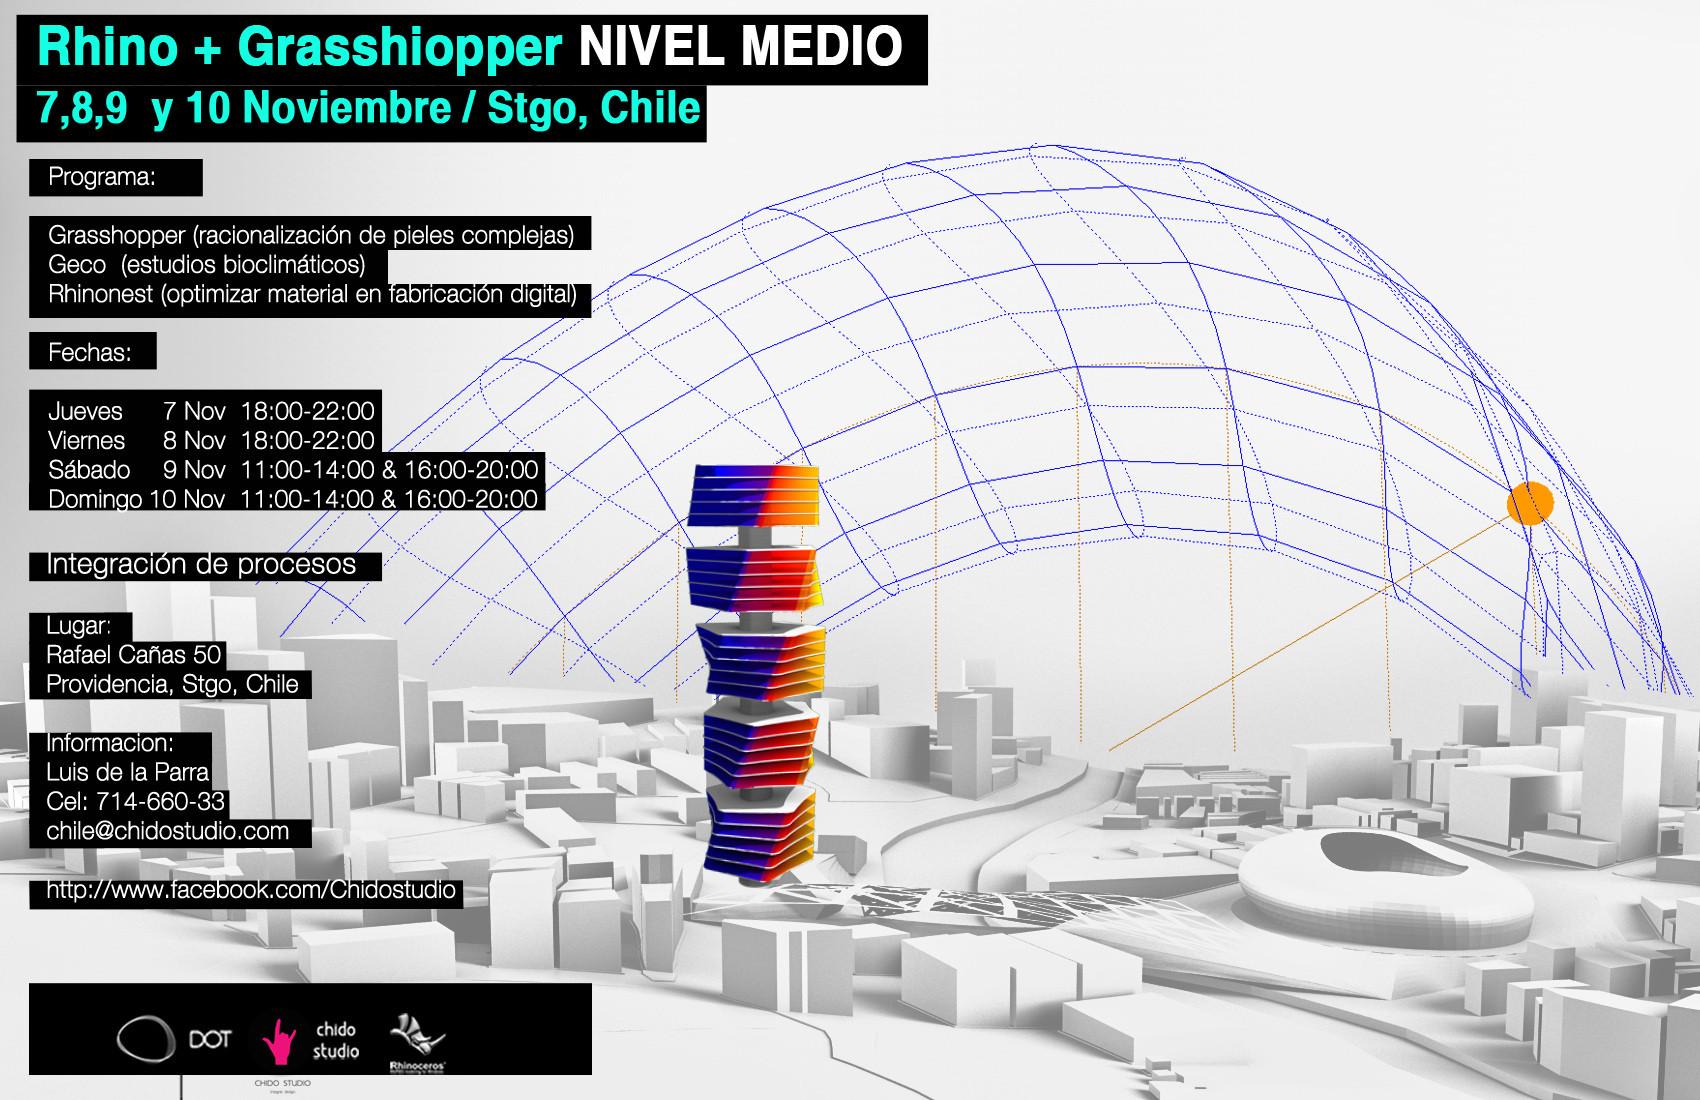 Workshop Rhino + Grasshopper NIVEL MEDIO [¡Sorteamos un Cupo!]